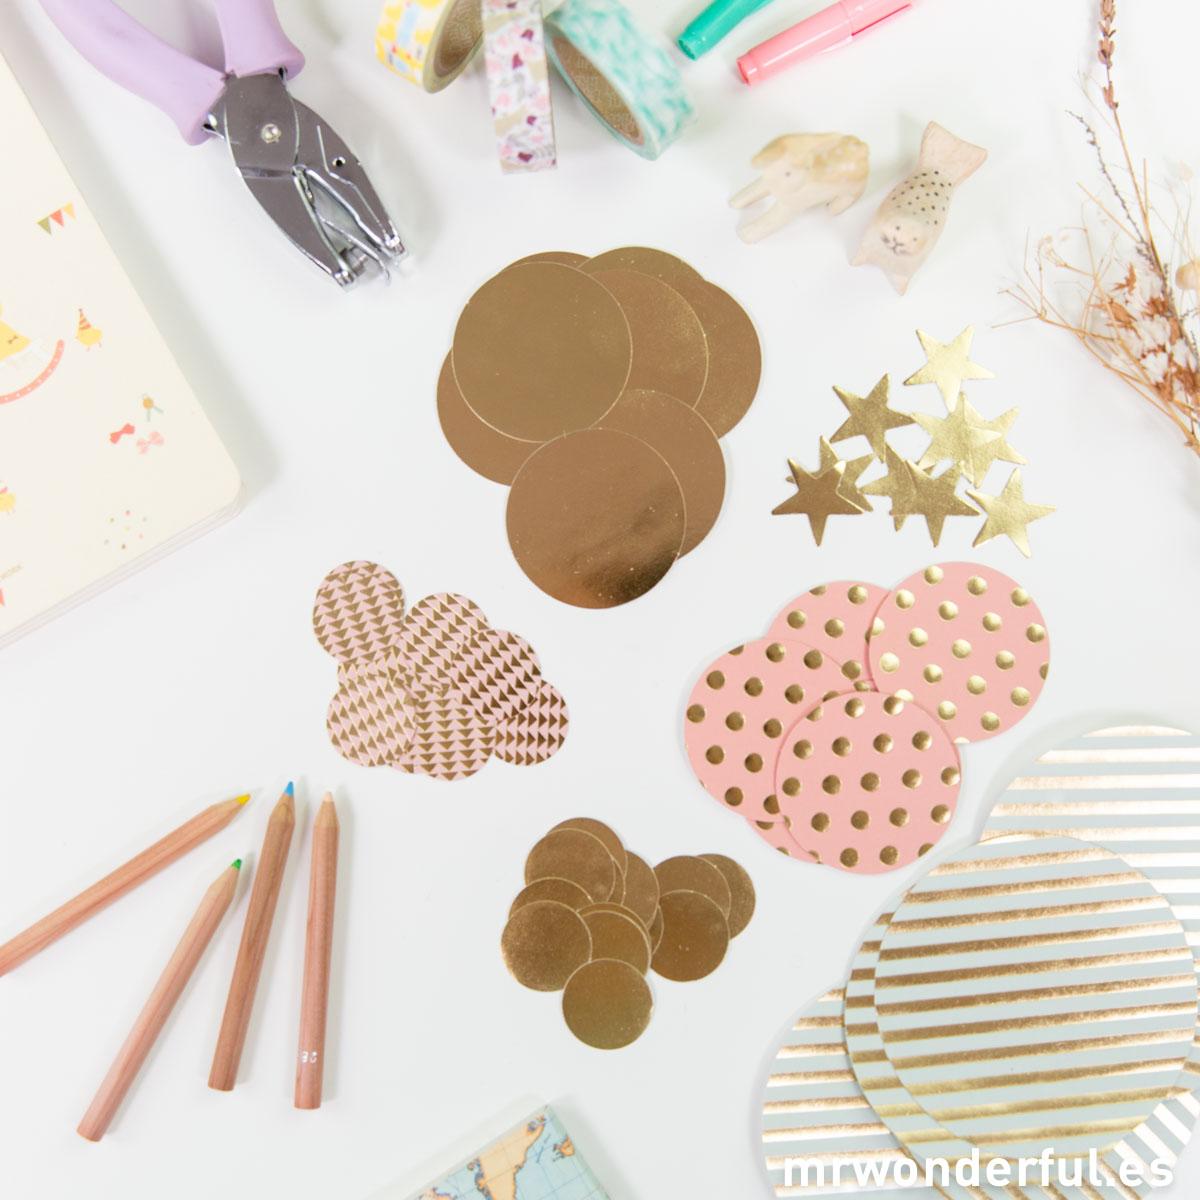 mrwonderful_TRP001_Surtido-confetti-papel-color-dorado-pastel-1